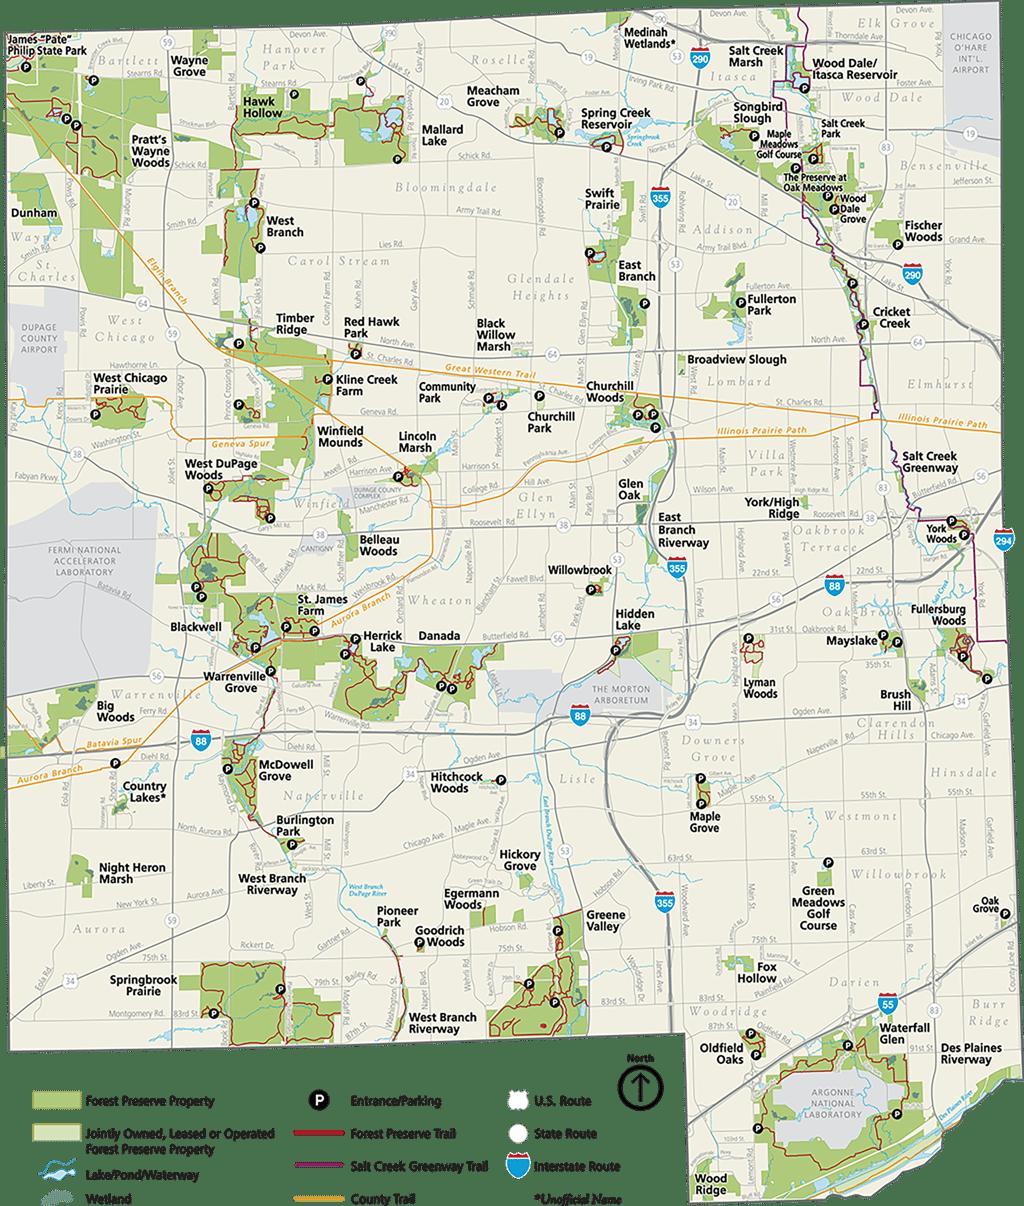 American University Map Wake Forest University Campus Map Zoning - American university map